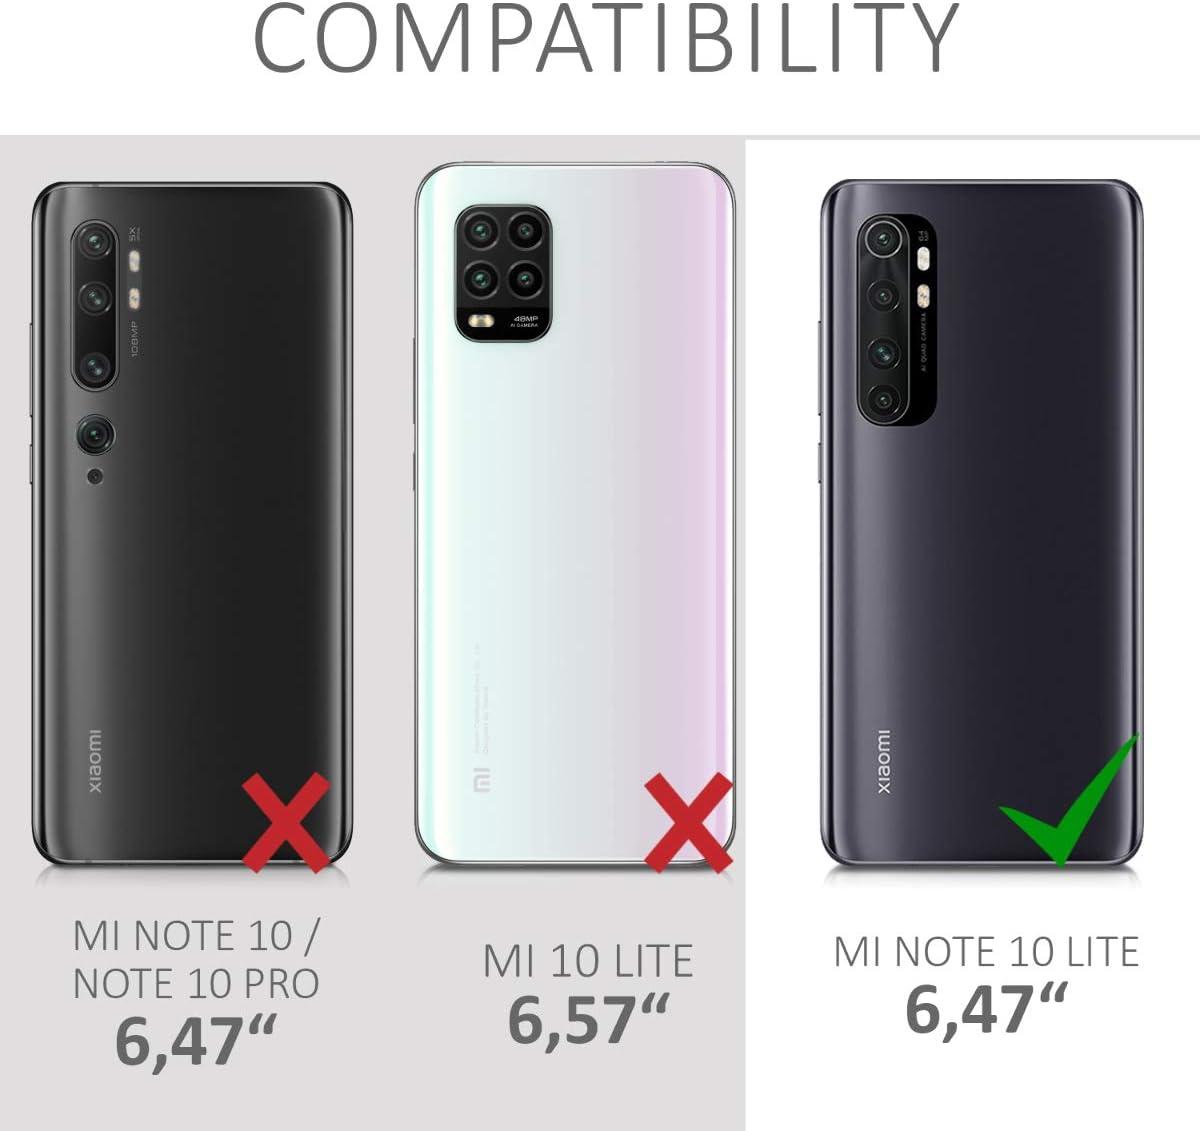 Protector Trasero en petr/óleo Mate kwmobile Funda Compatible con Xiaomi Mi Note 10 Lite Carcasa de TPU Silicona